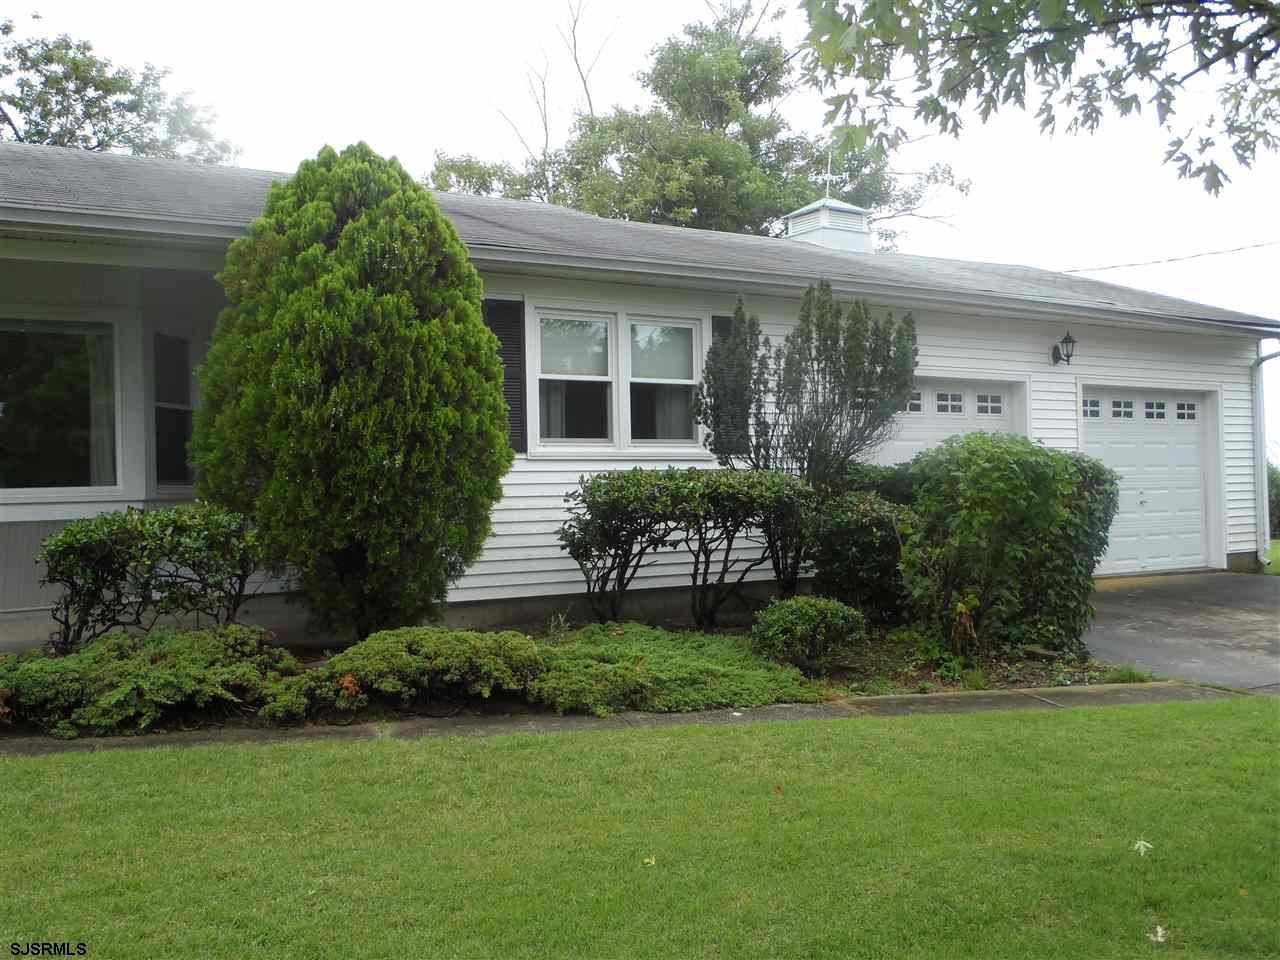 50 Gulph Mill Road Road, Somers Point, NJ 08224